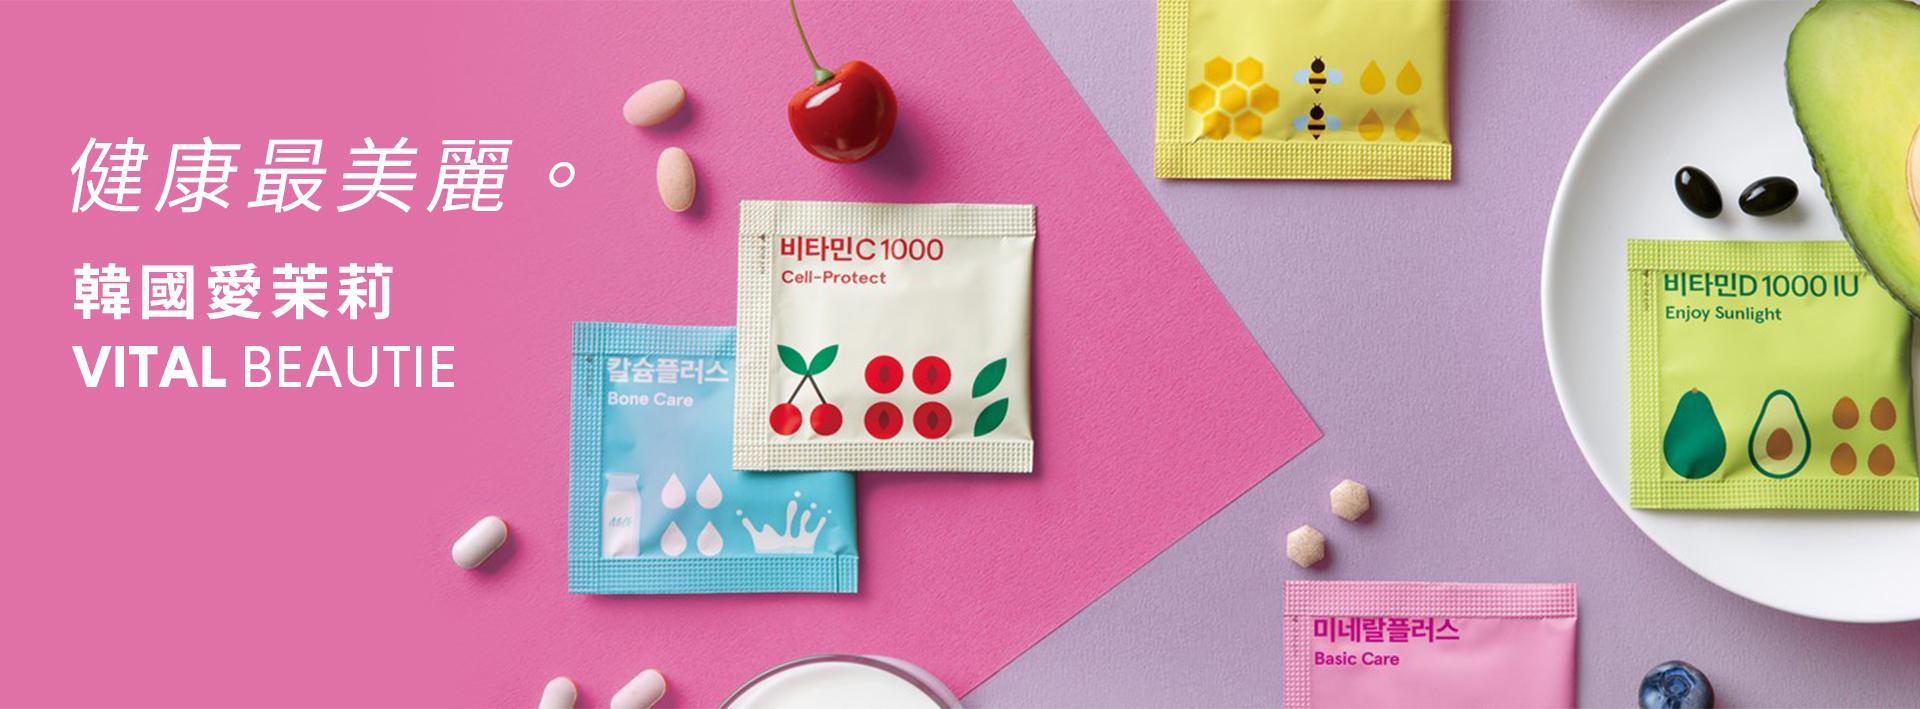 Vital Beautie 韓國草本保健食品 吃出健康美麗